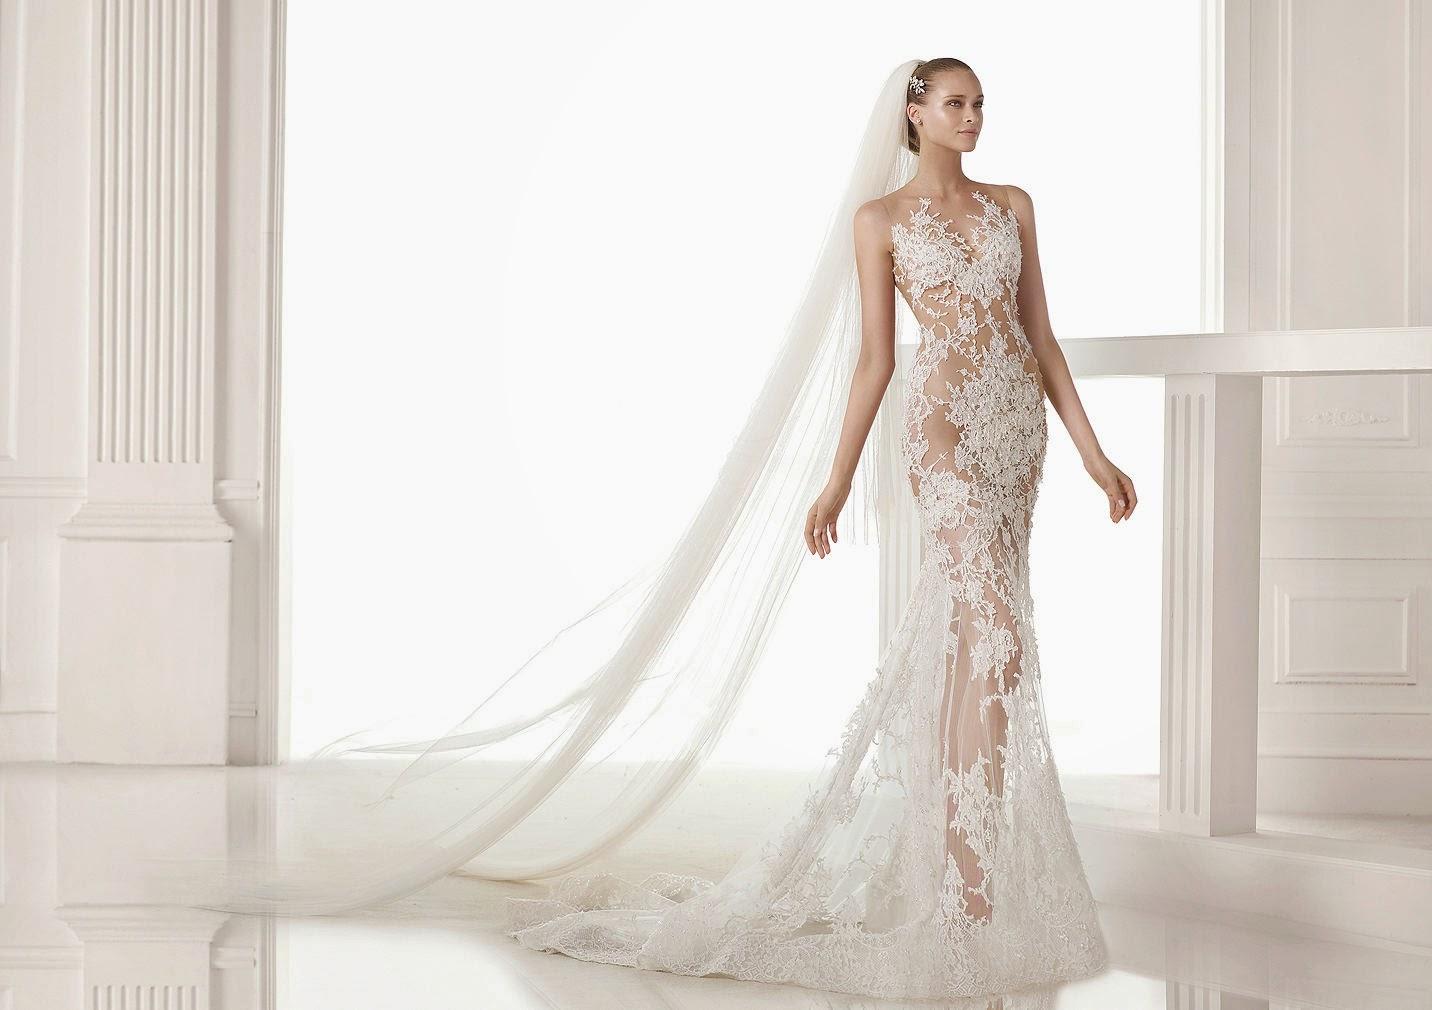 Brautkleid – abendkleiderhaus